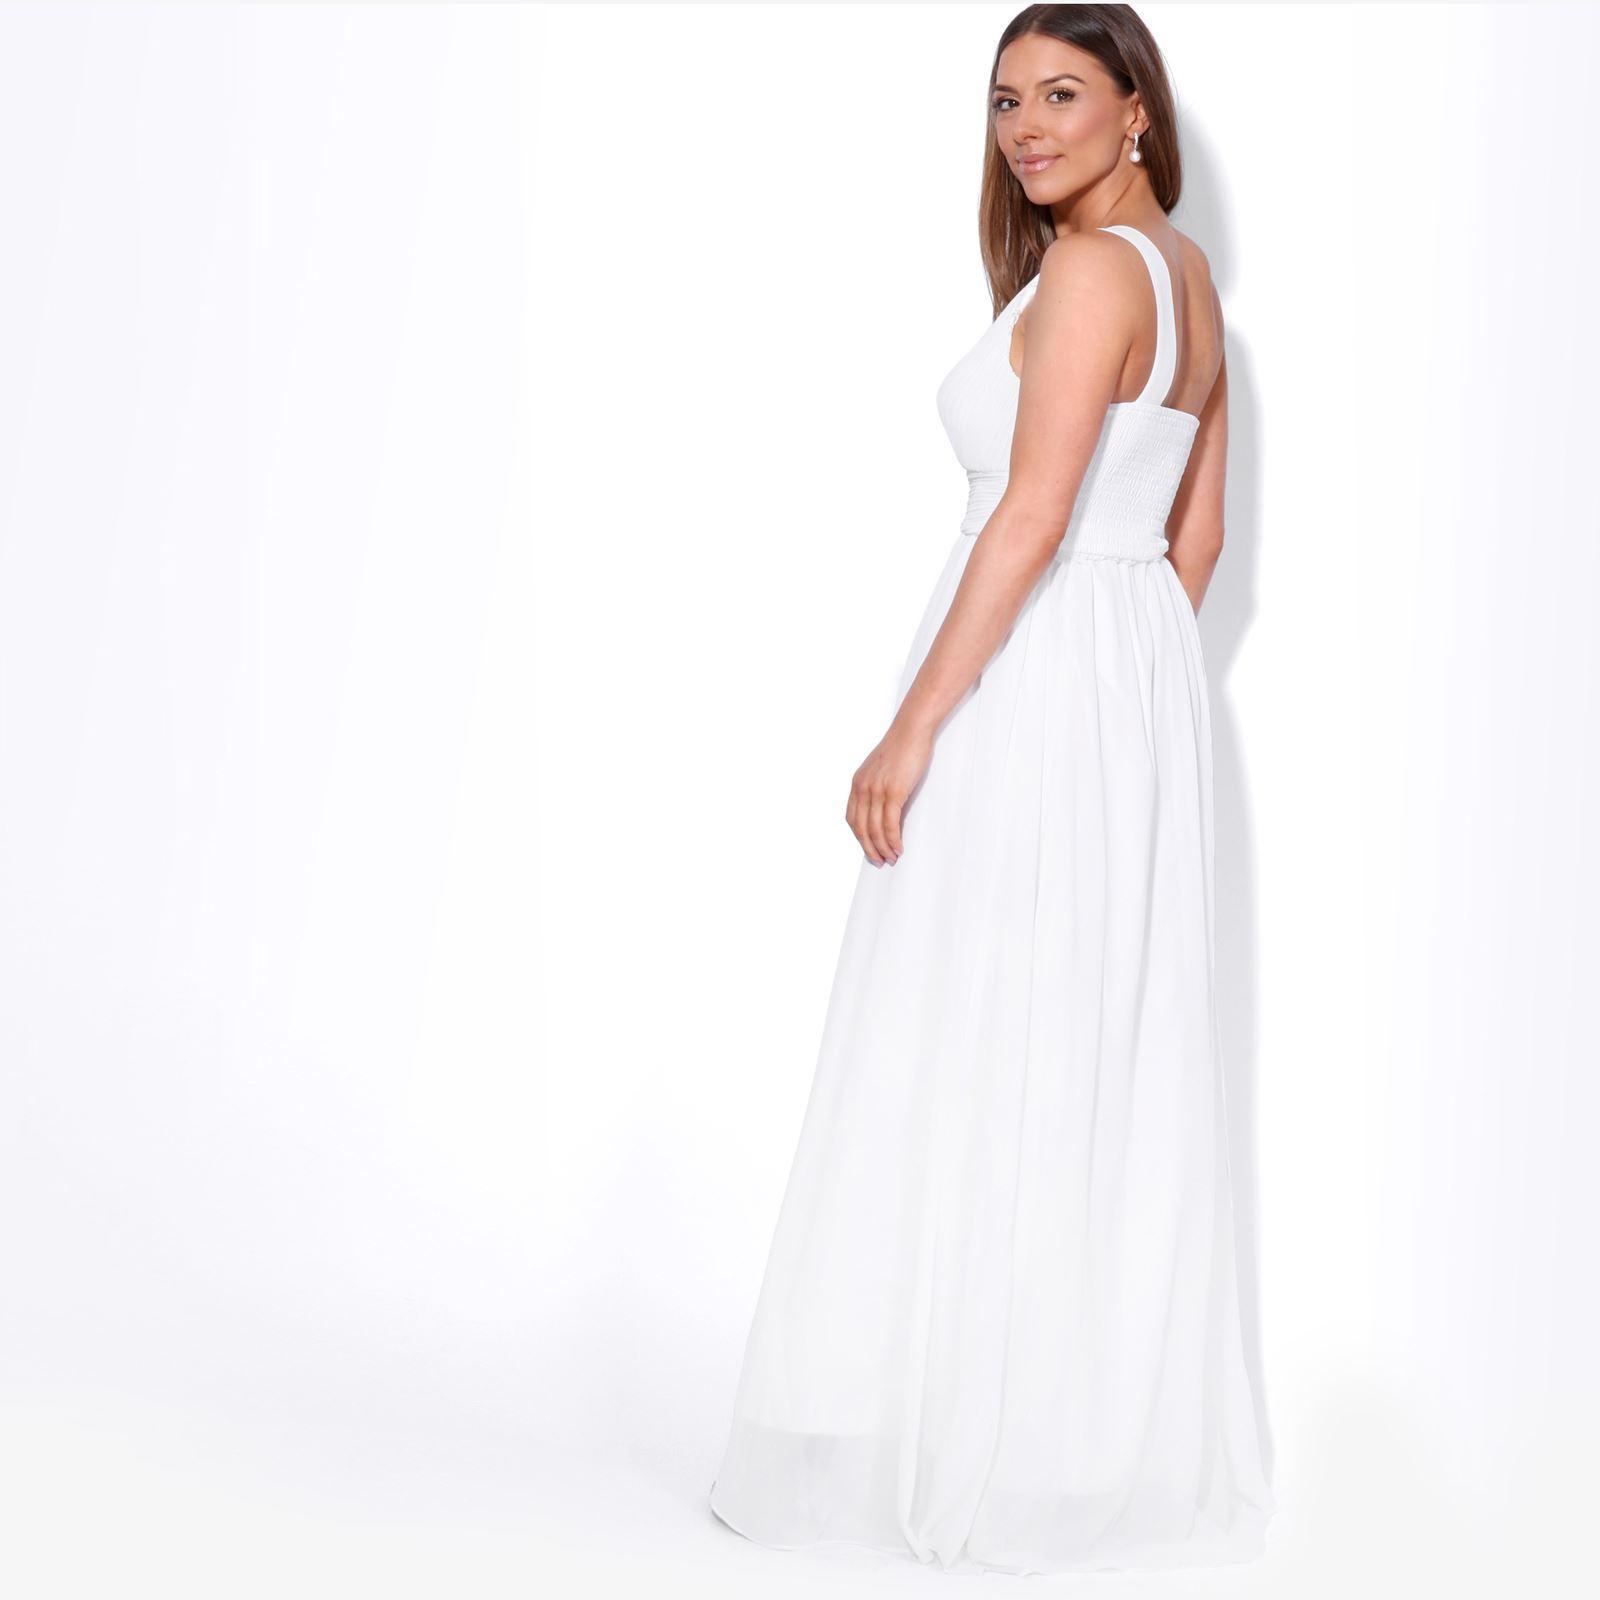 Womens-Wedding-Bridesmaid-Prom-Dress-Formal-One-Off-Shoulder-Long-Evening-8-18 thumbnail 79